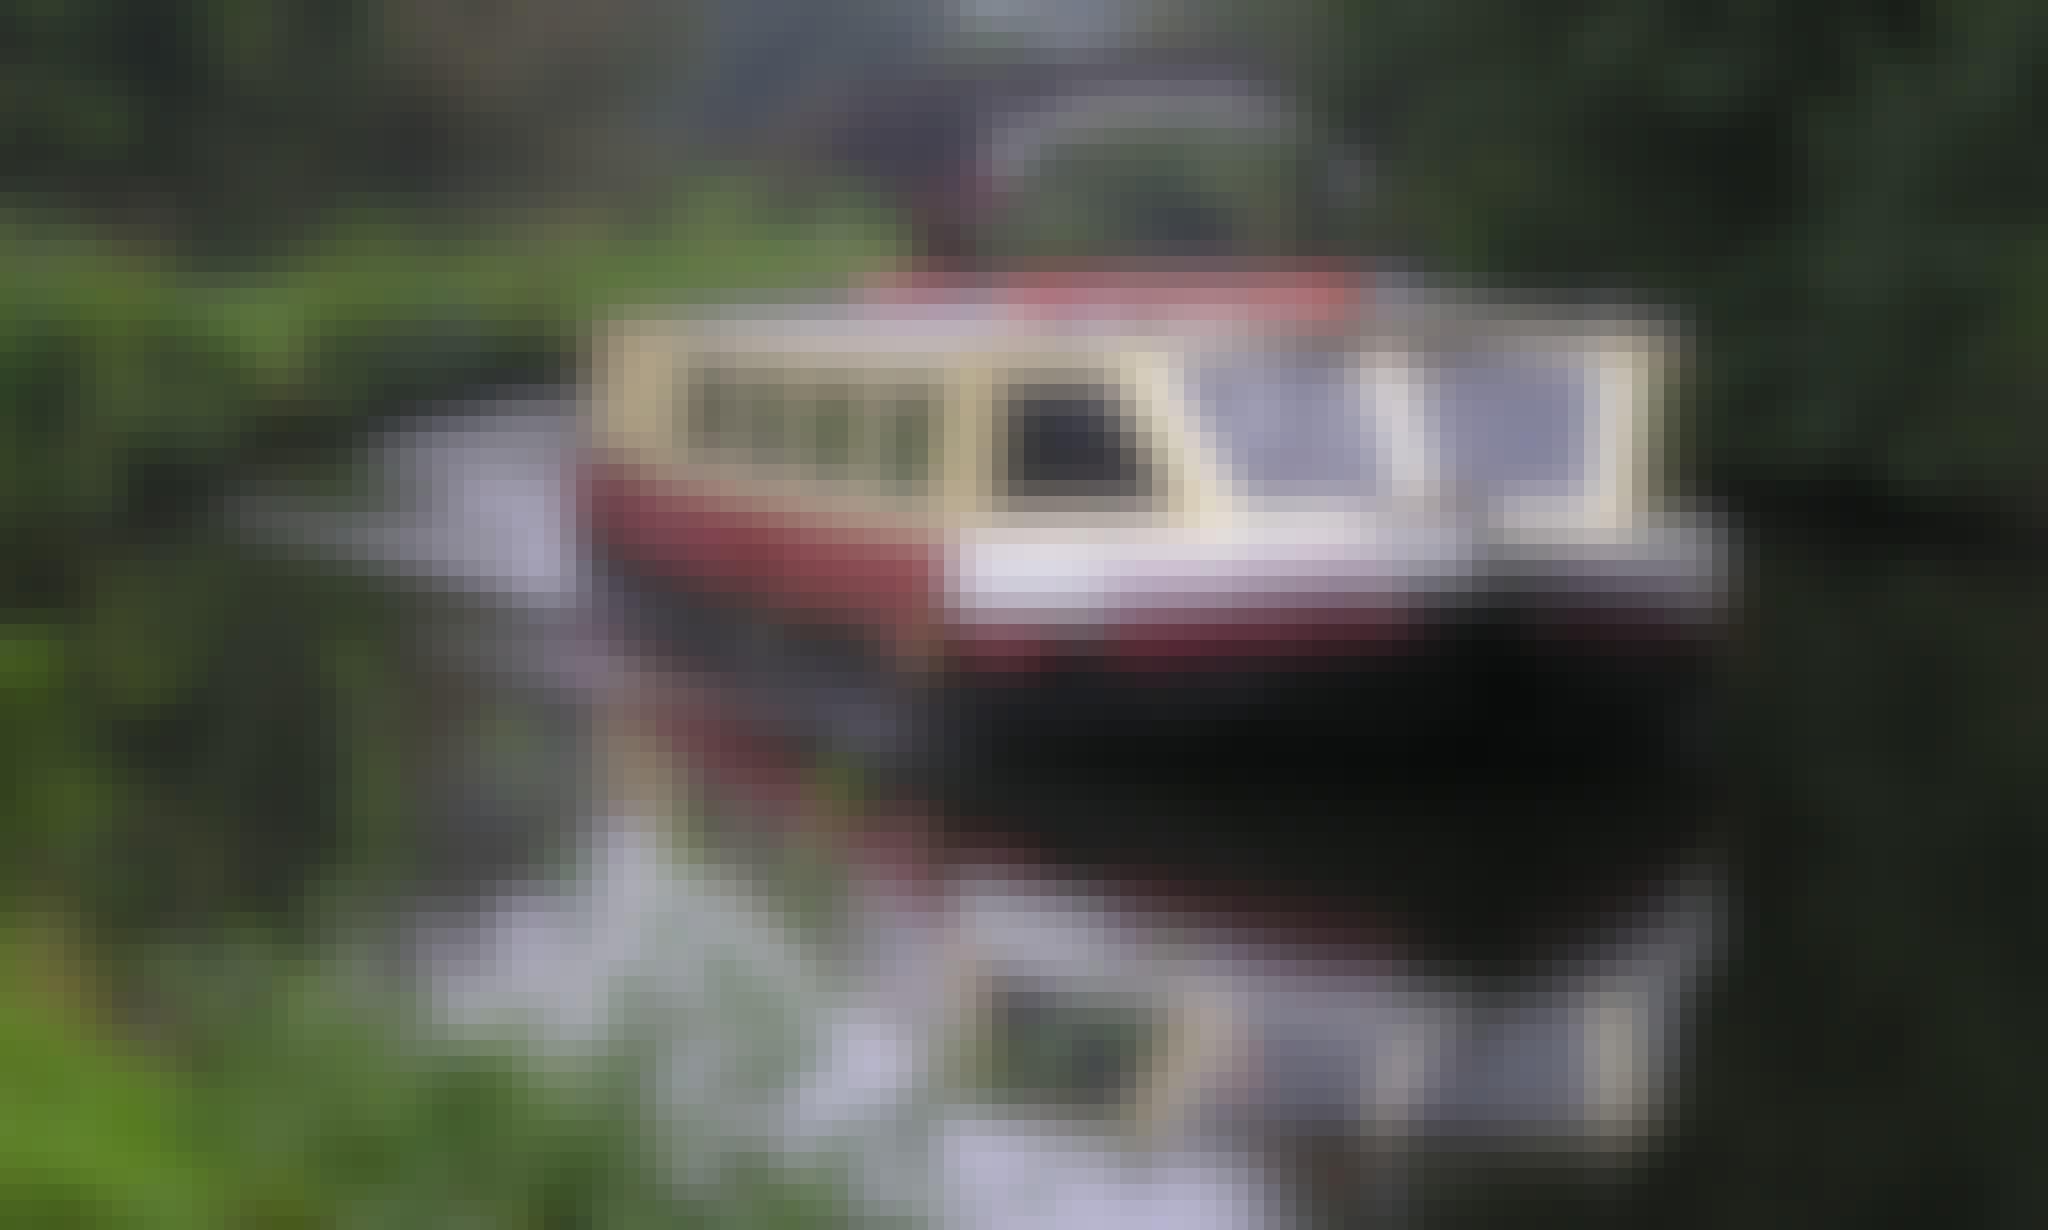 Canal Boat Trips in Foulridge, United Kingdom